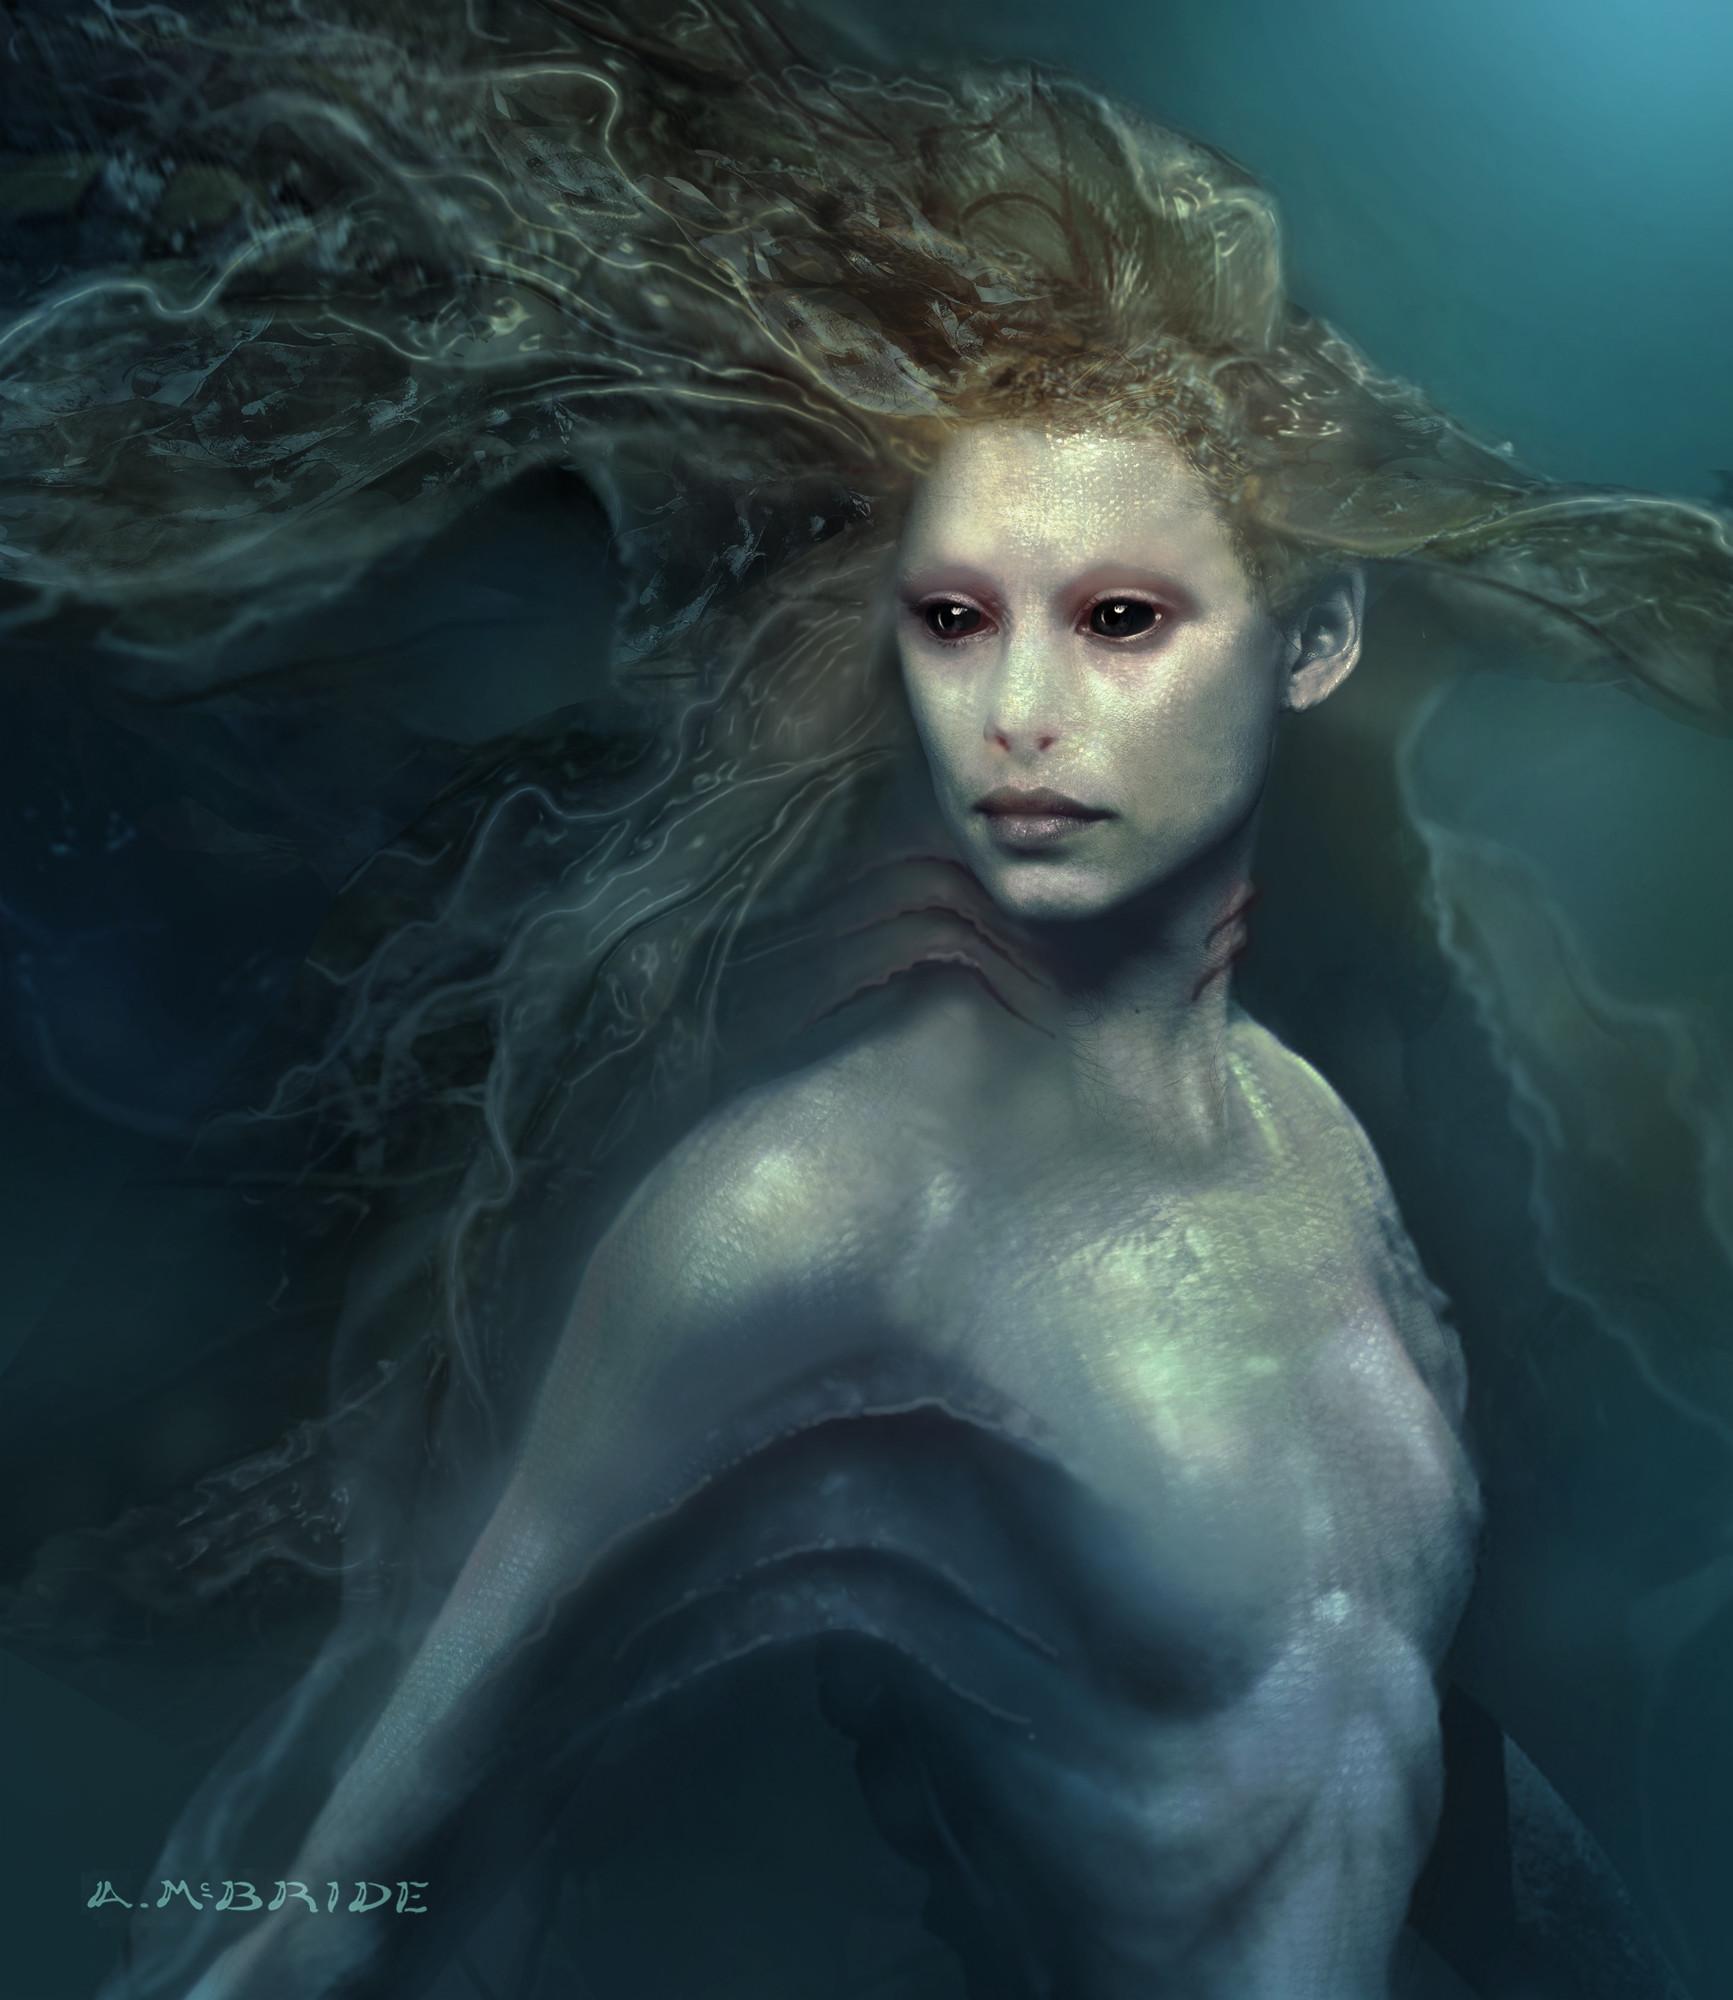 Aaron mcbride mermaid portrait 03